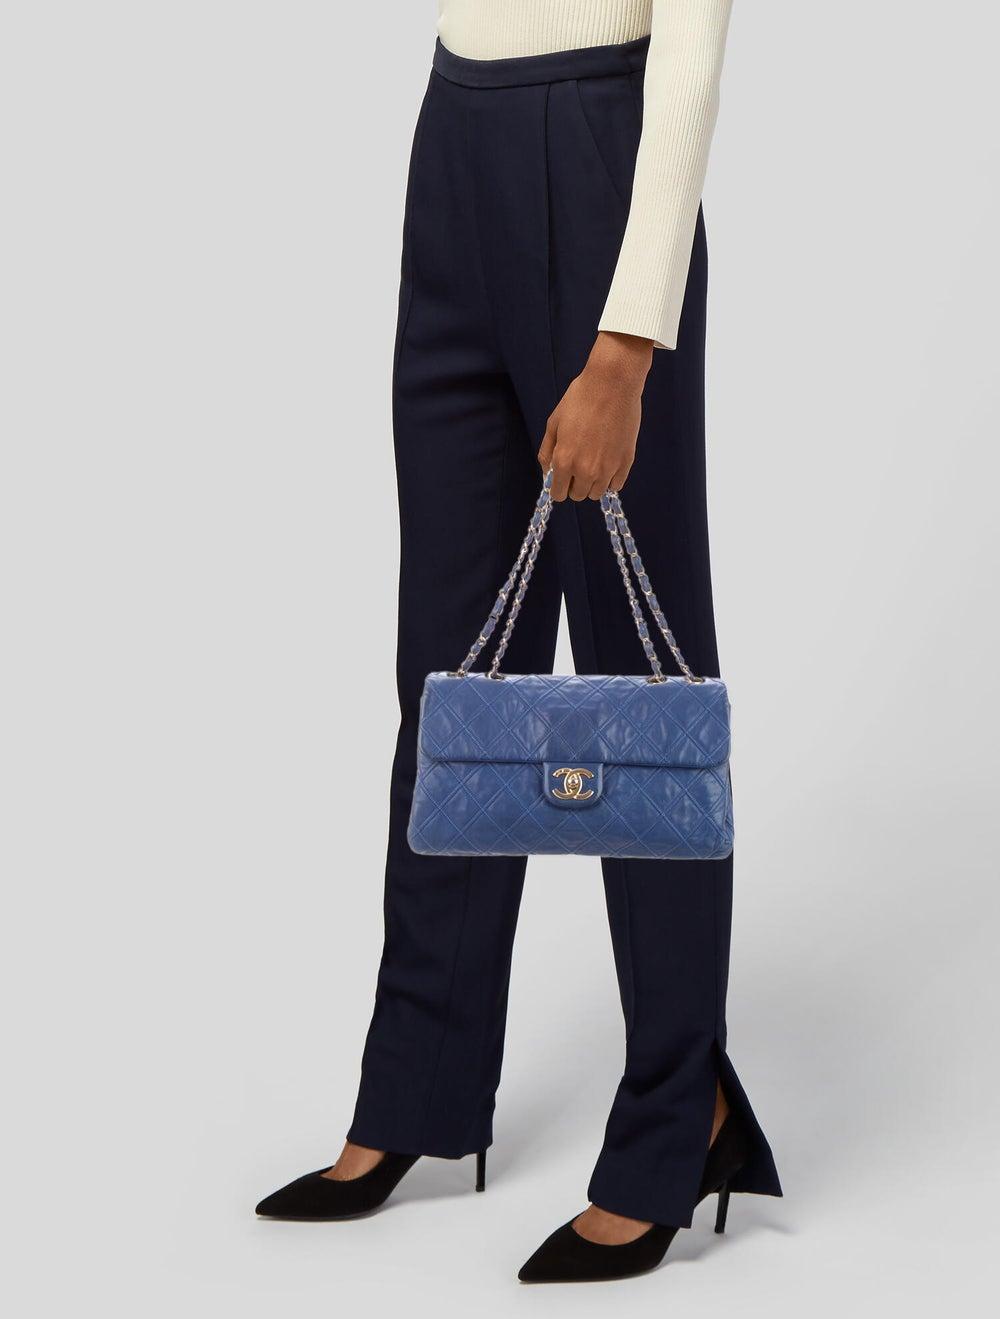 Chanel Thin City Flap Bag Blue - image 2